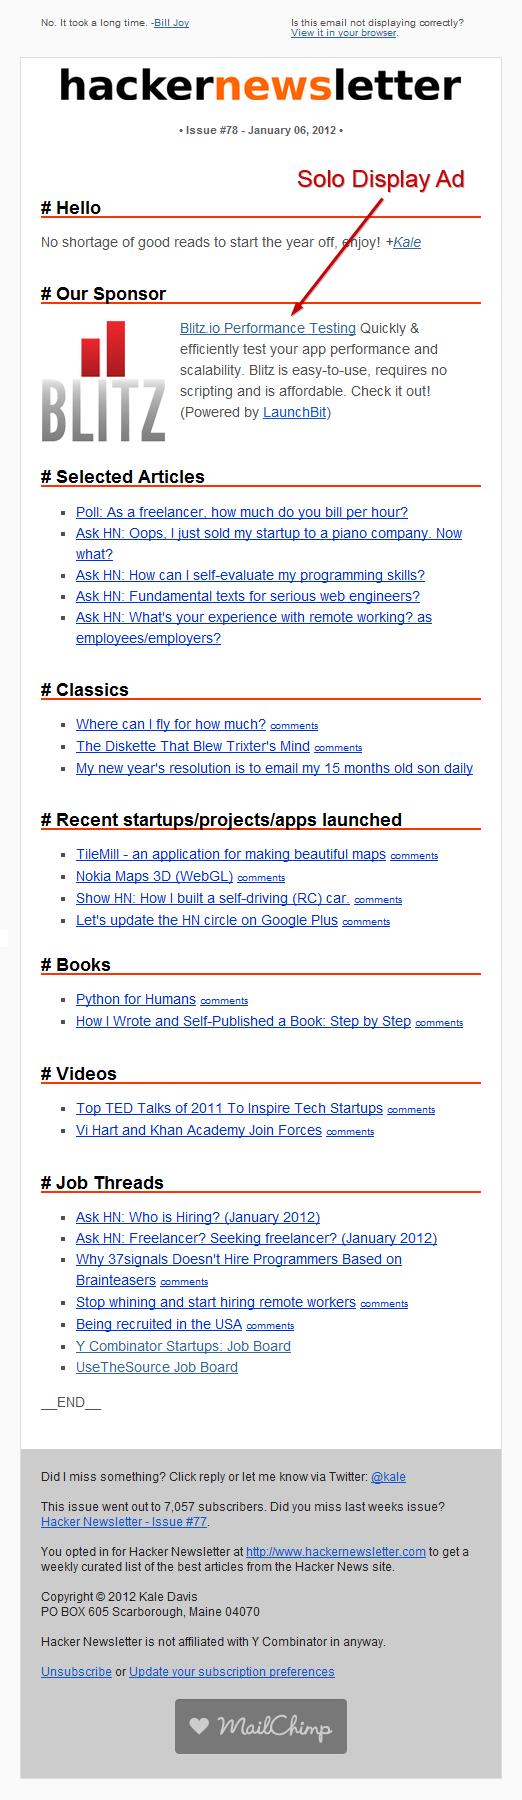 hacker newsletter ads